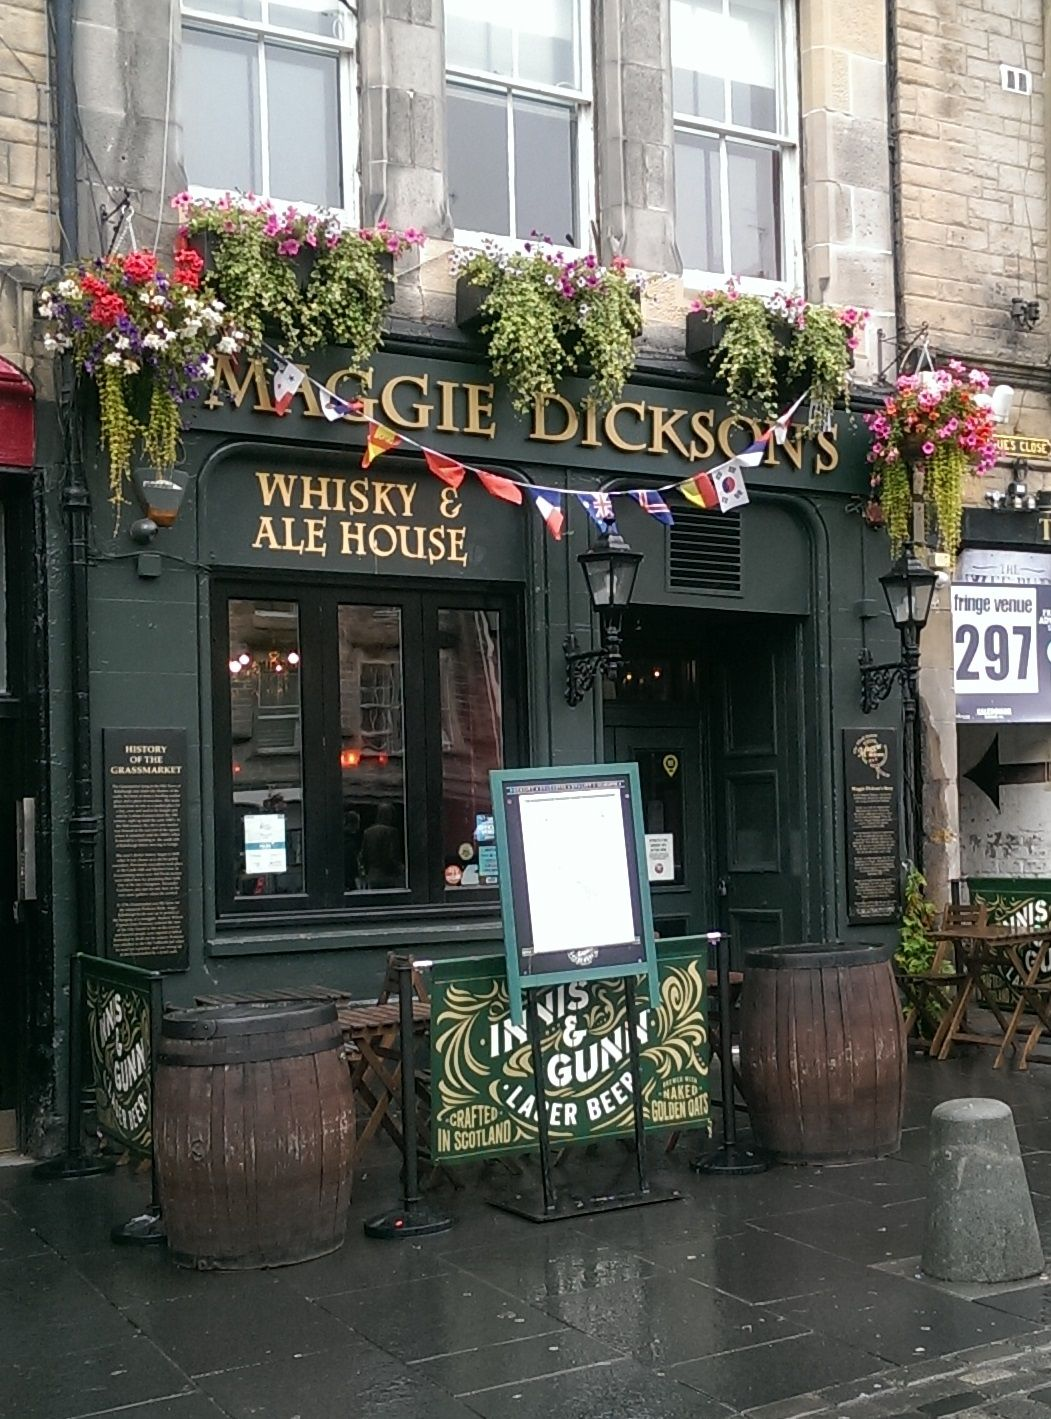 Maggie Dicksons Edinburgh